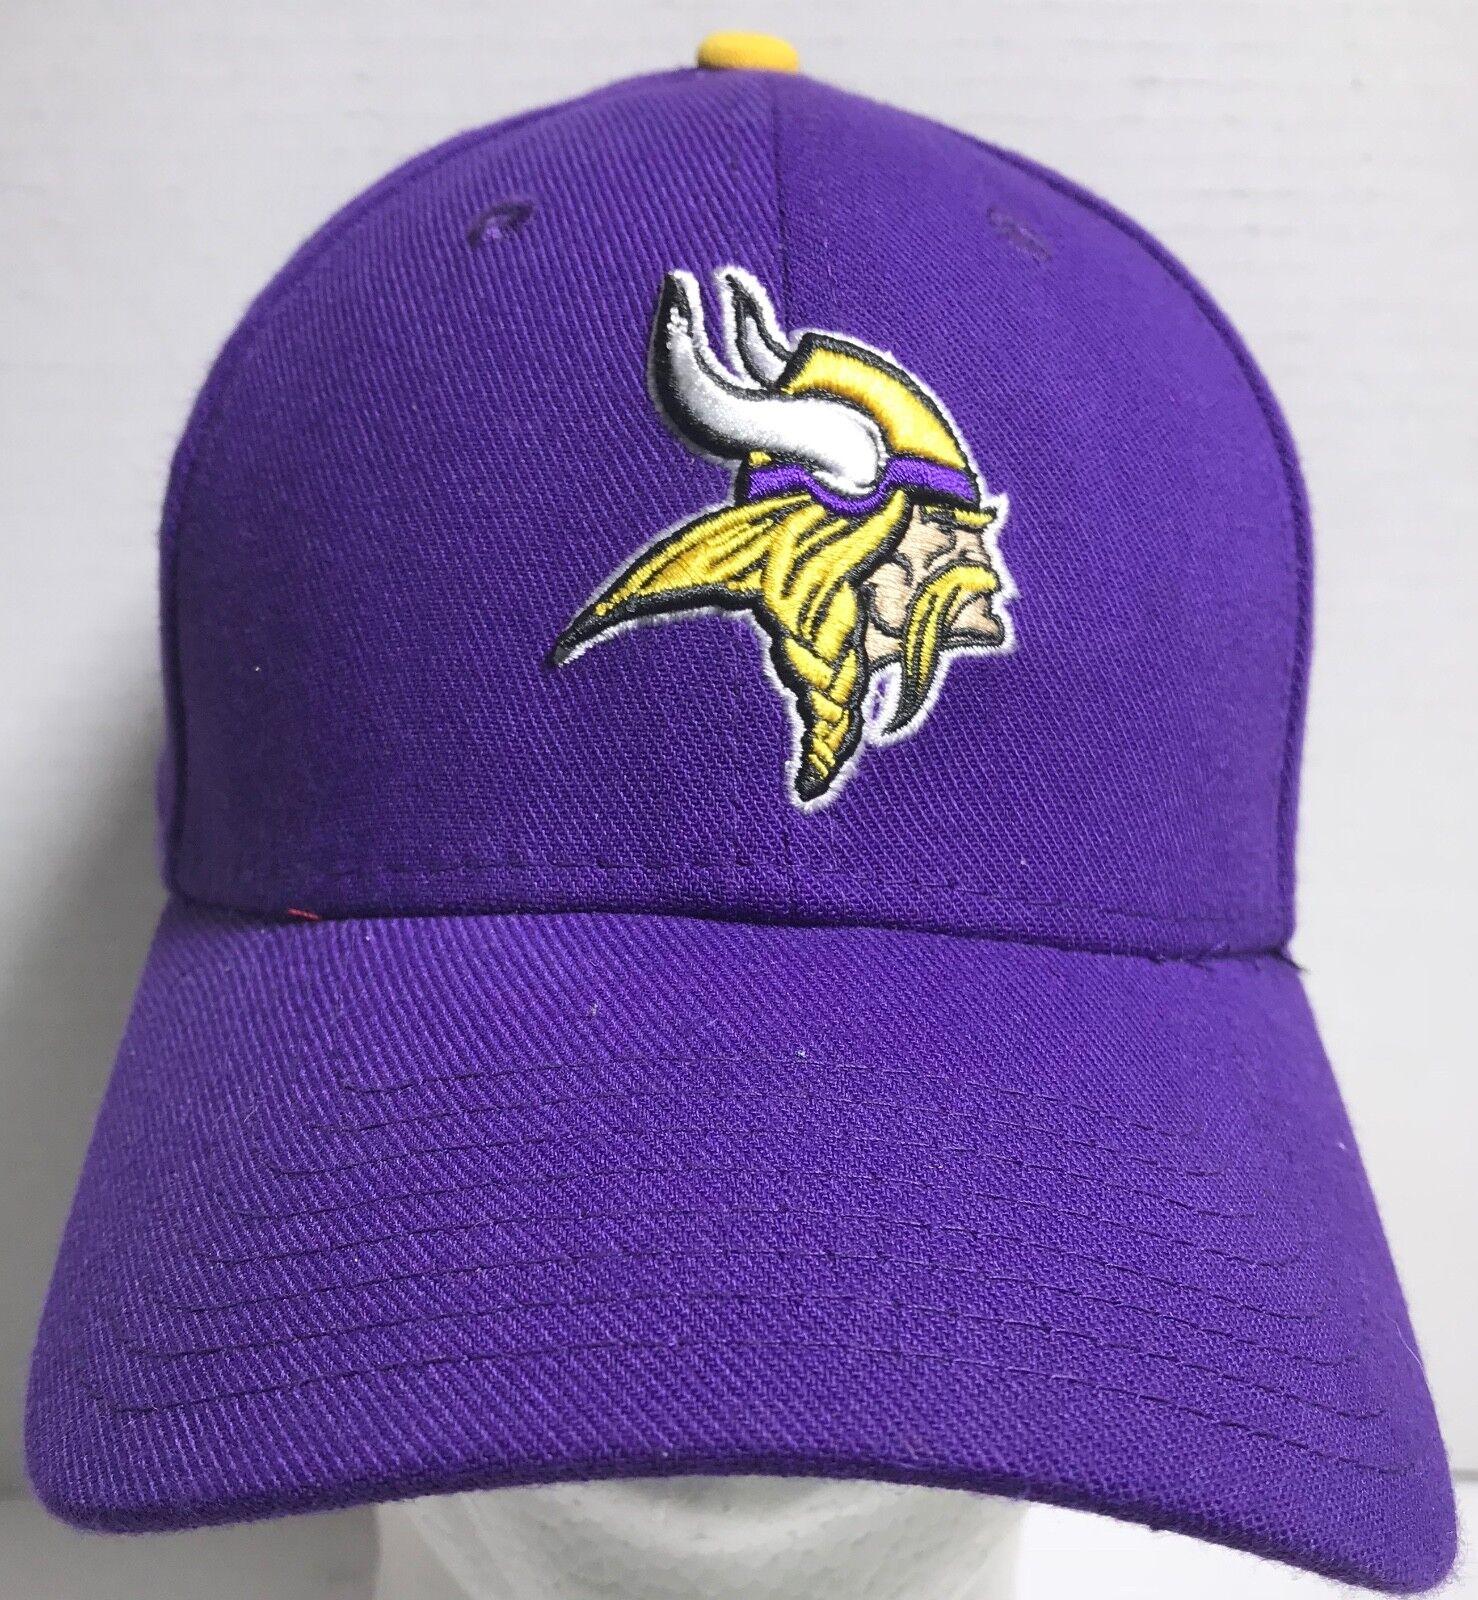 a0e31e061 ... coupon for minnesota vikings cap newera purple 59fifty true fitted  small medium nfl purple newera hat best price minnesota vikings adjustable  ...